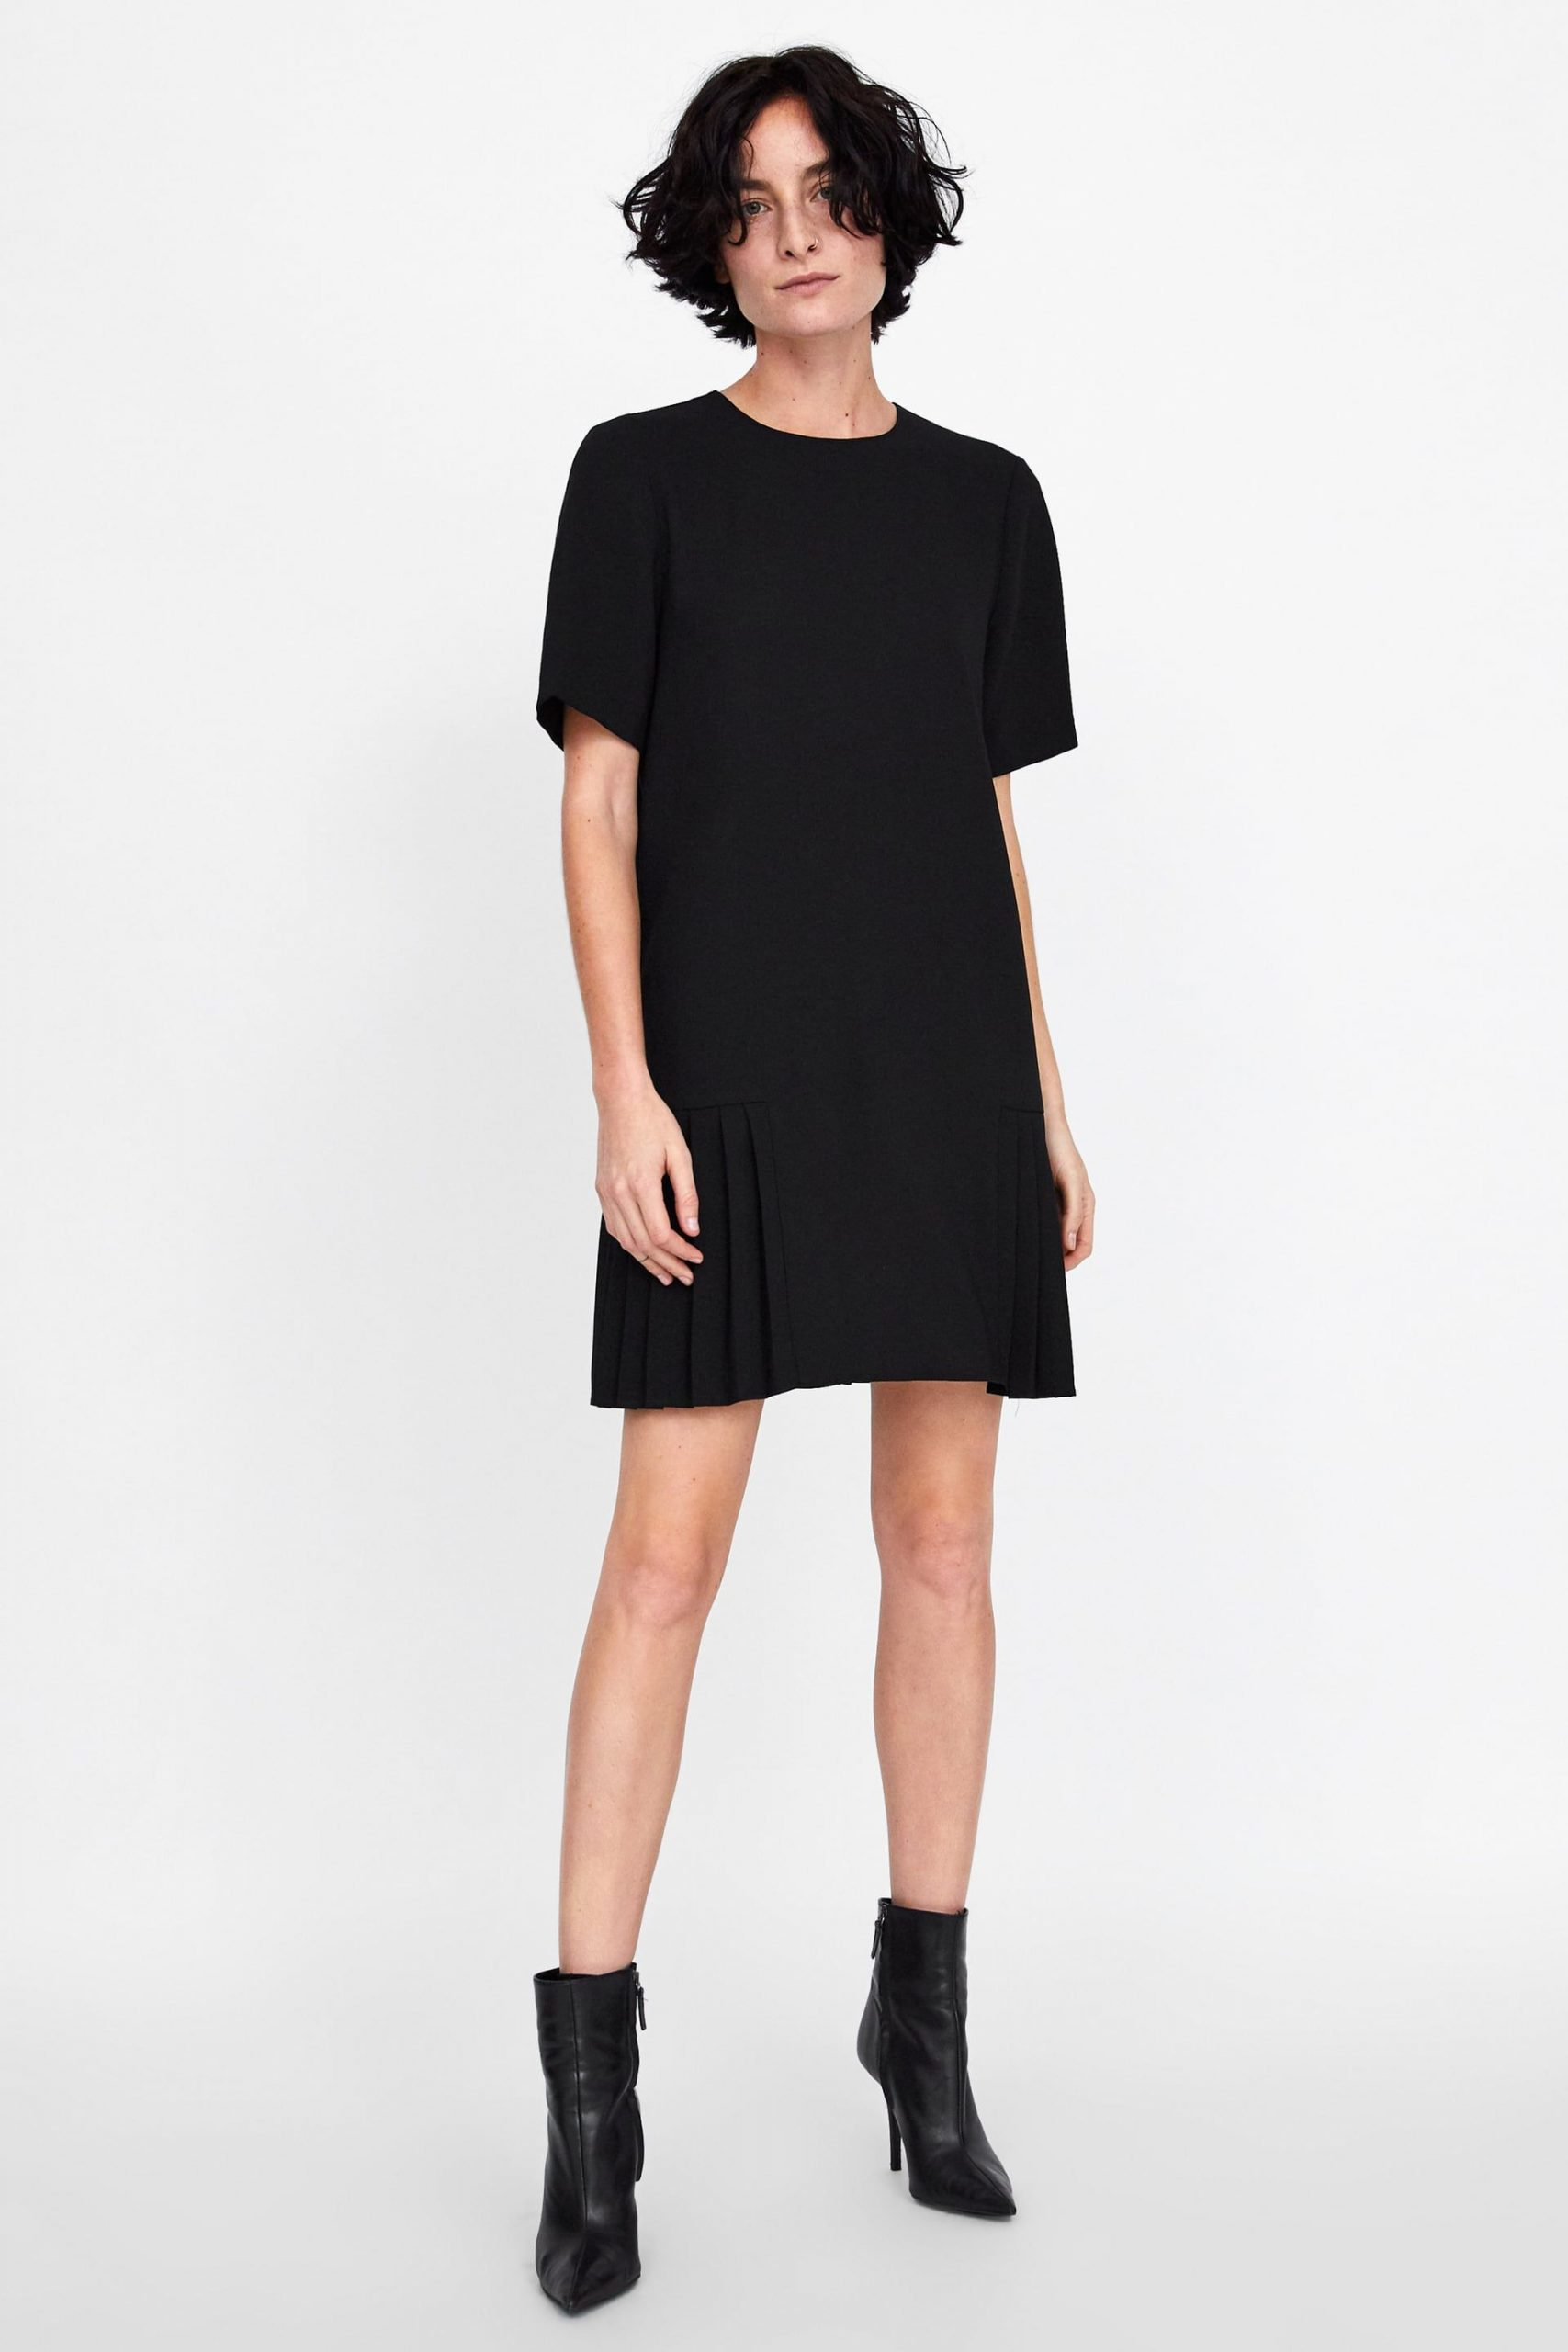 Zara  New Collection  Vestido Com Pregas  Pleated Dress